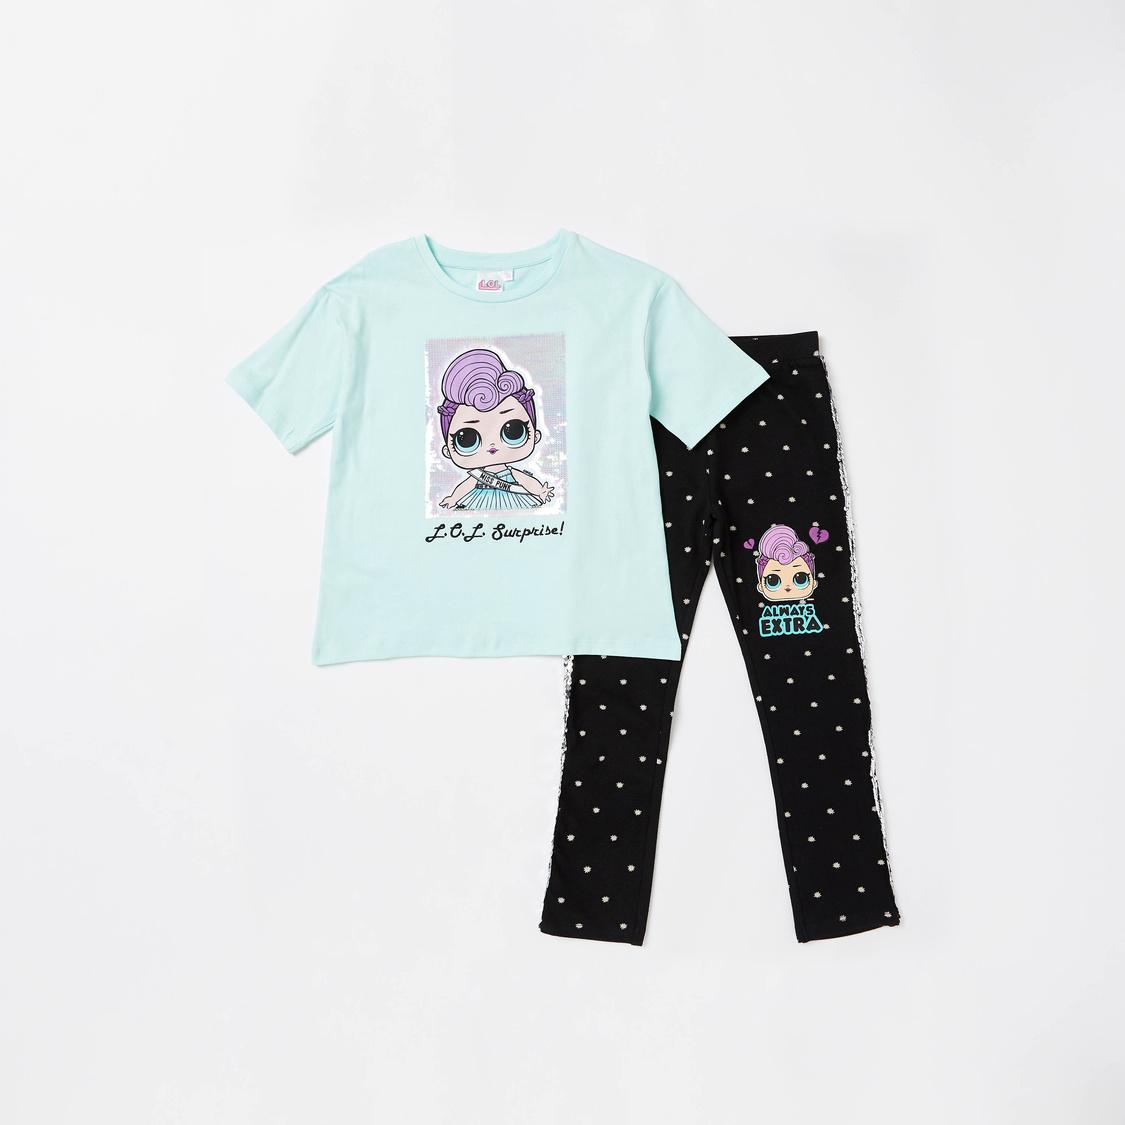 L.O.L. Surprise! Short Sleeves T-shirt and Full Length Legging Set